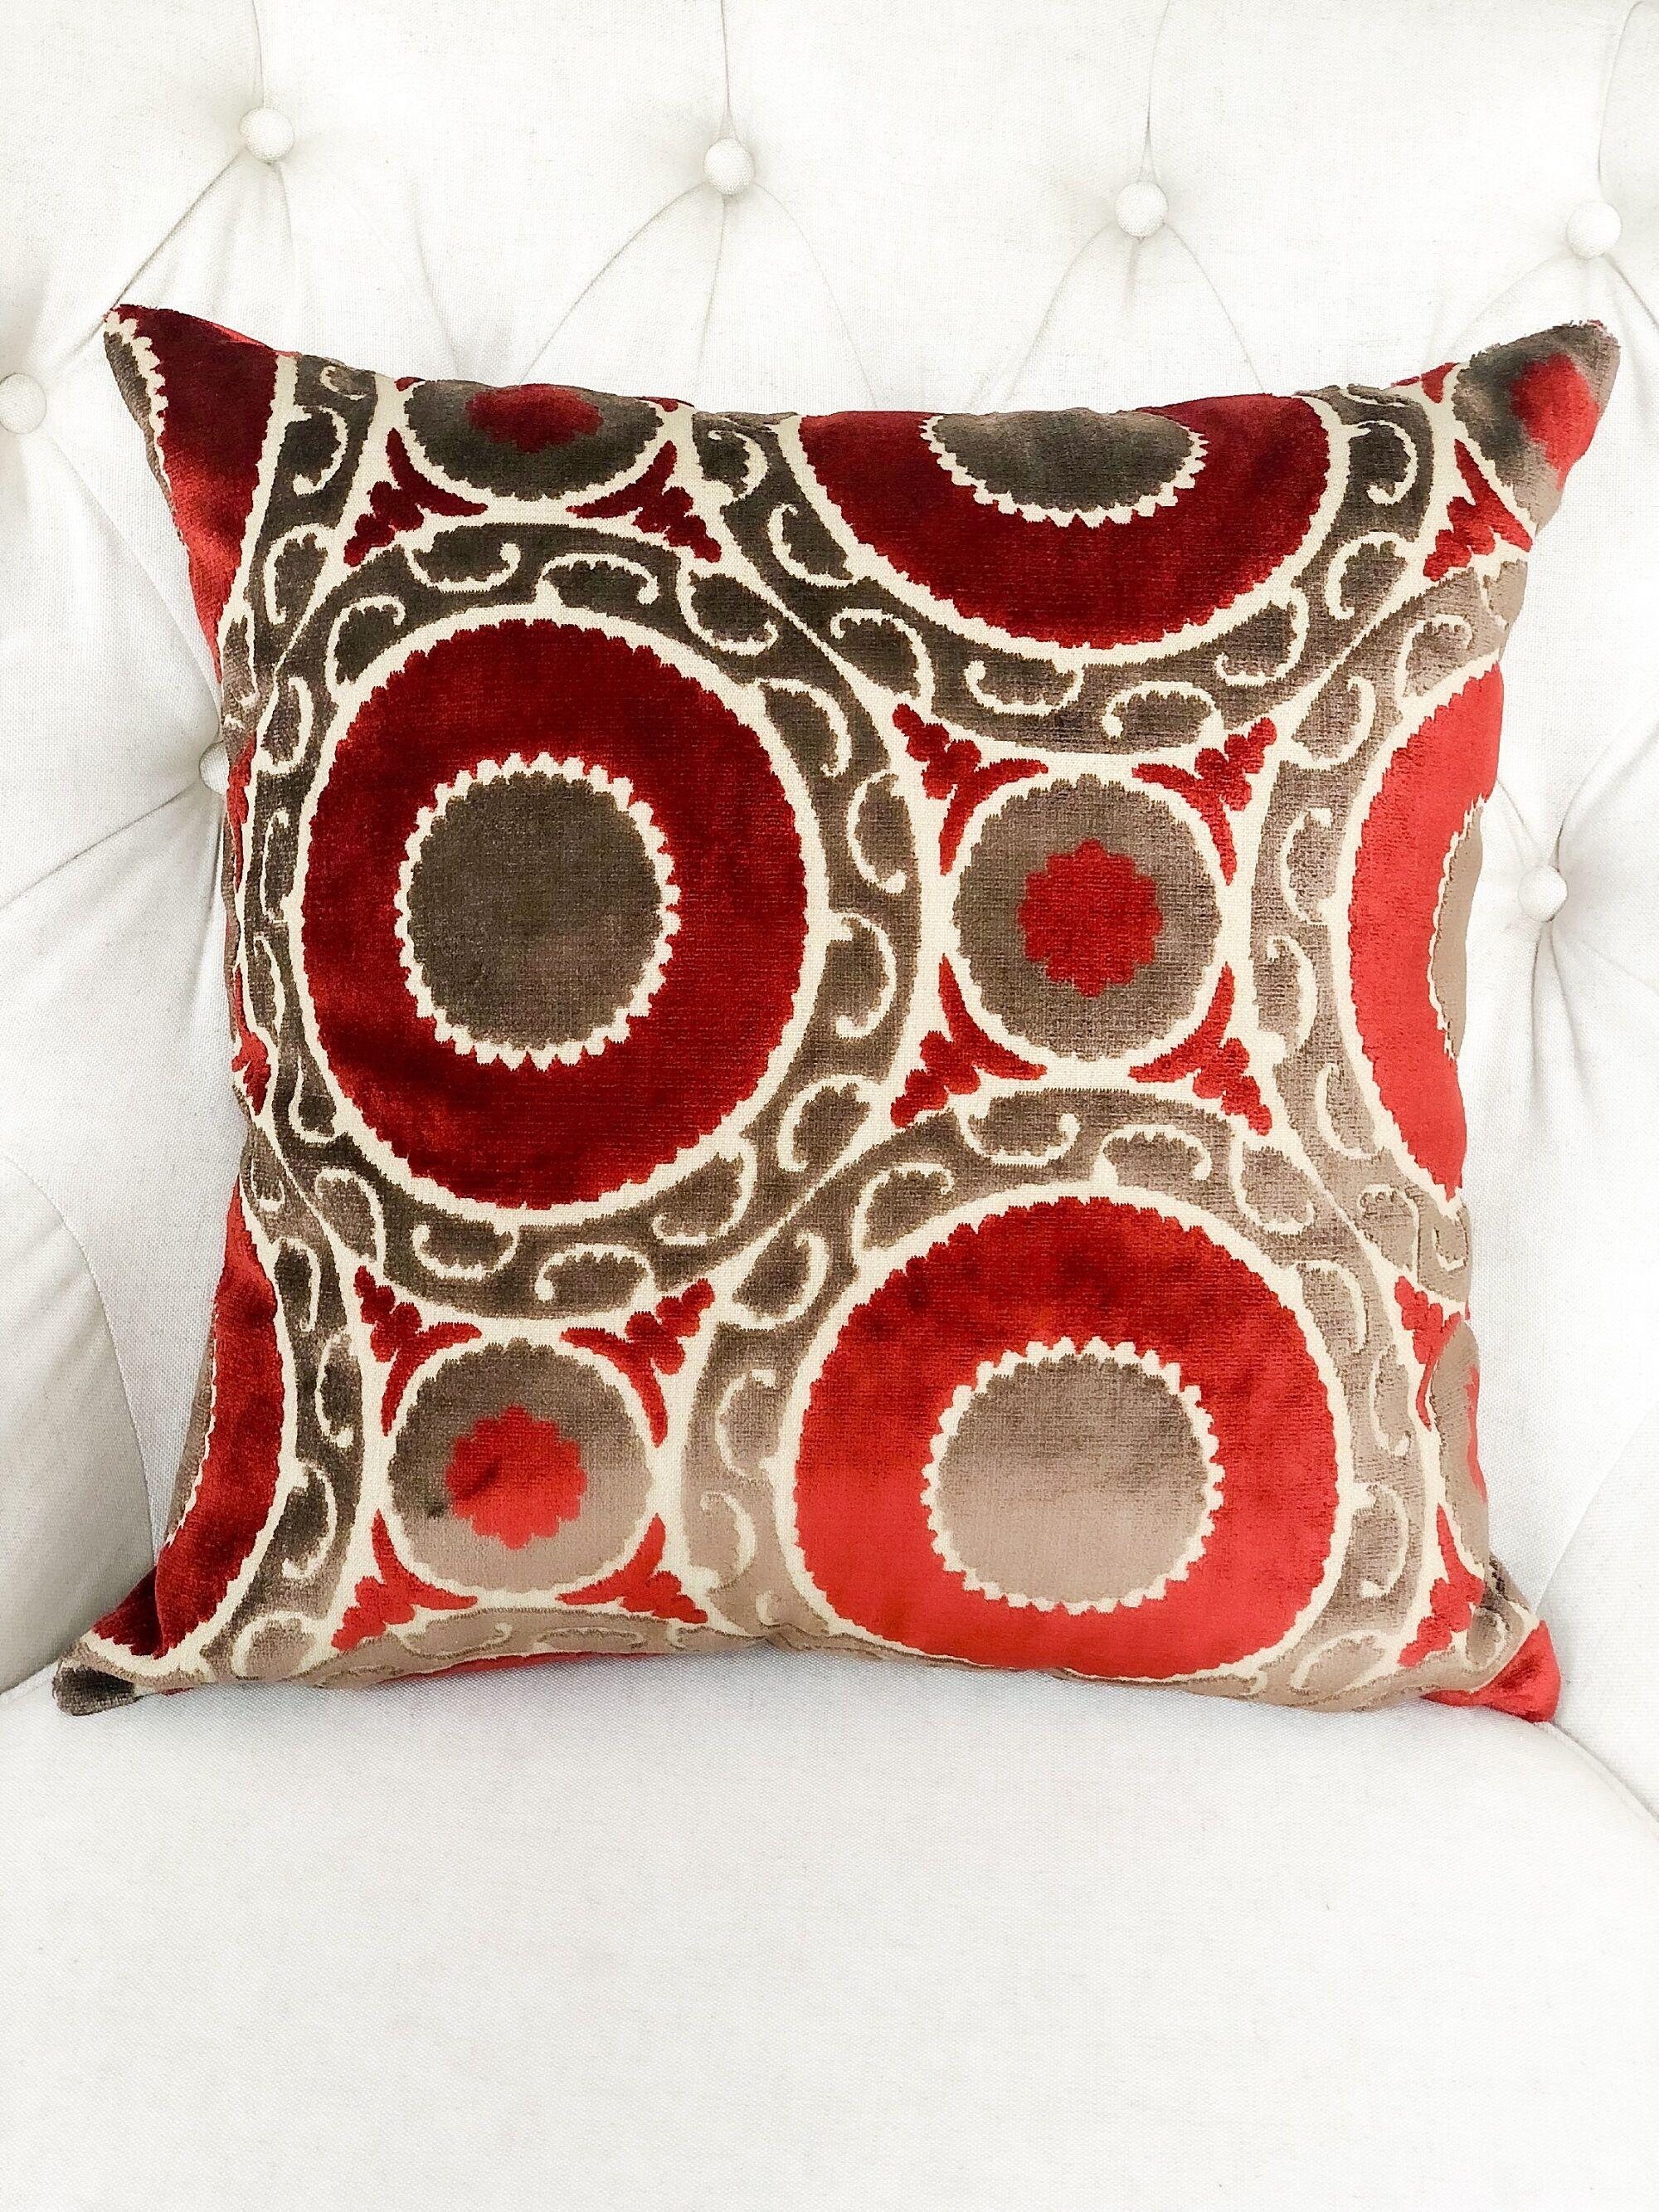 Bailor Handmade Luxury Pillow Size: 16